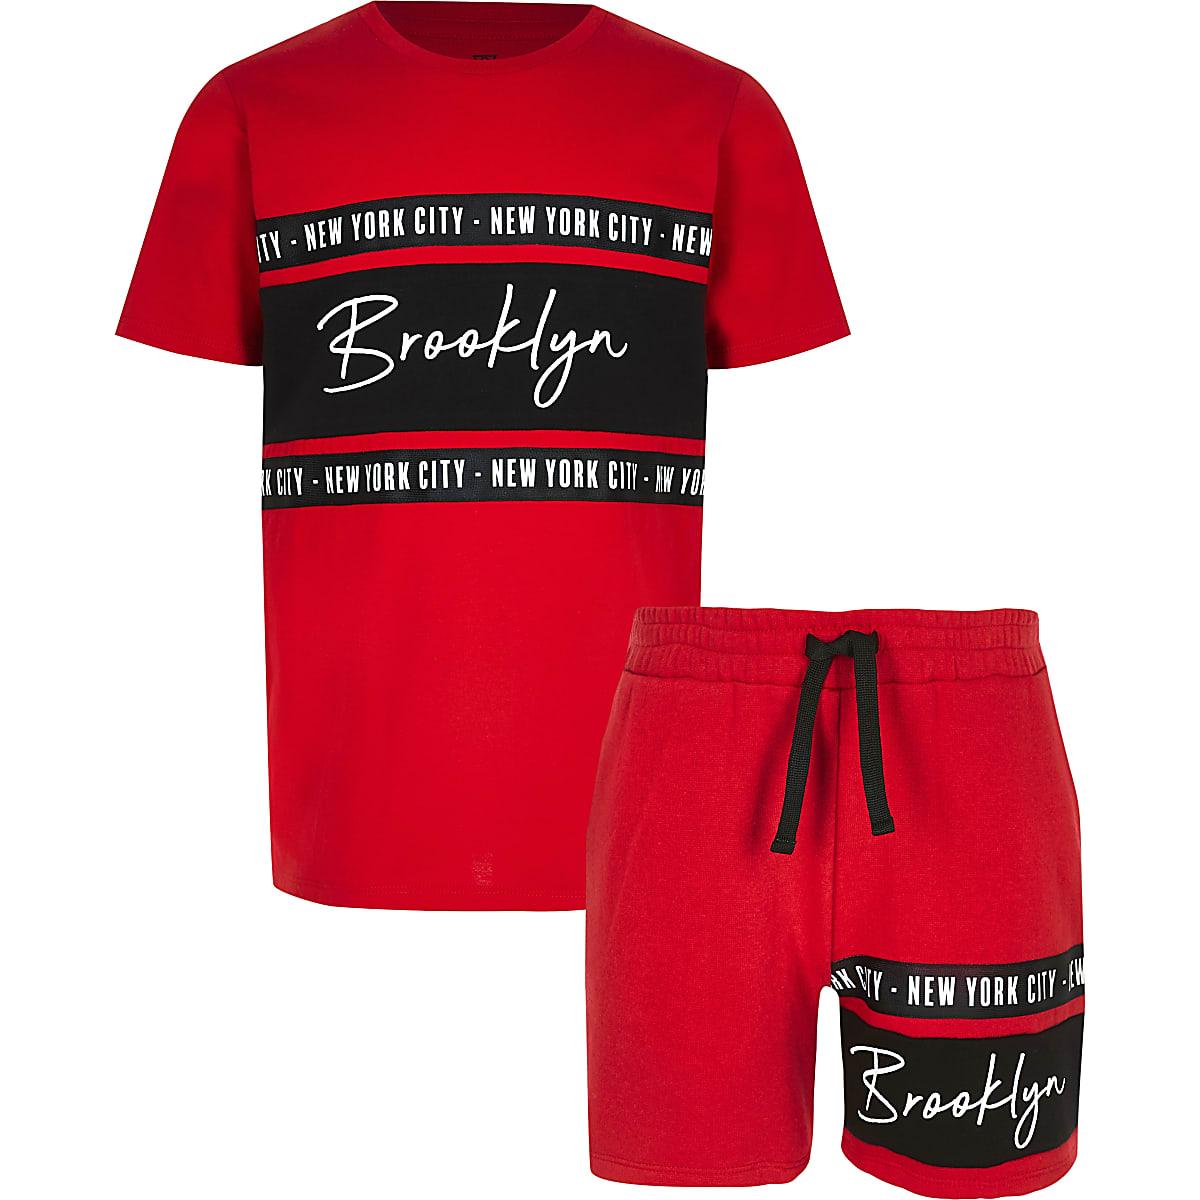 Boys red 'Brookyln' T-shirt outfit